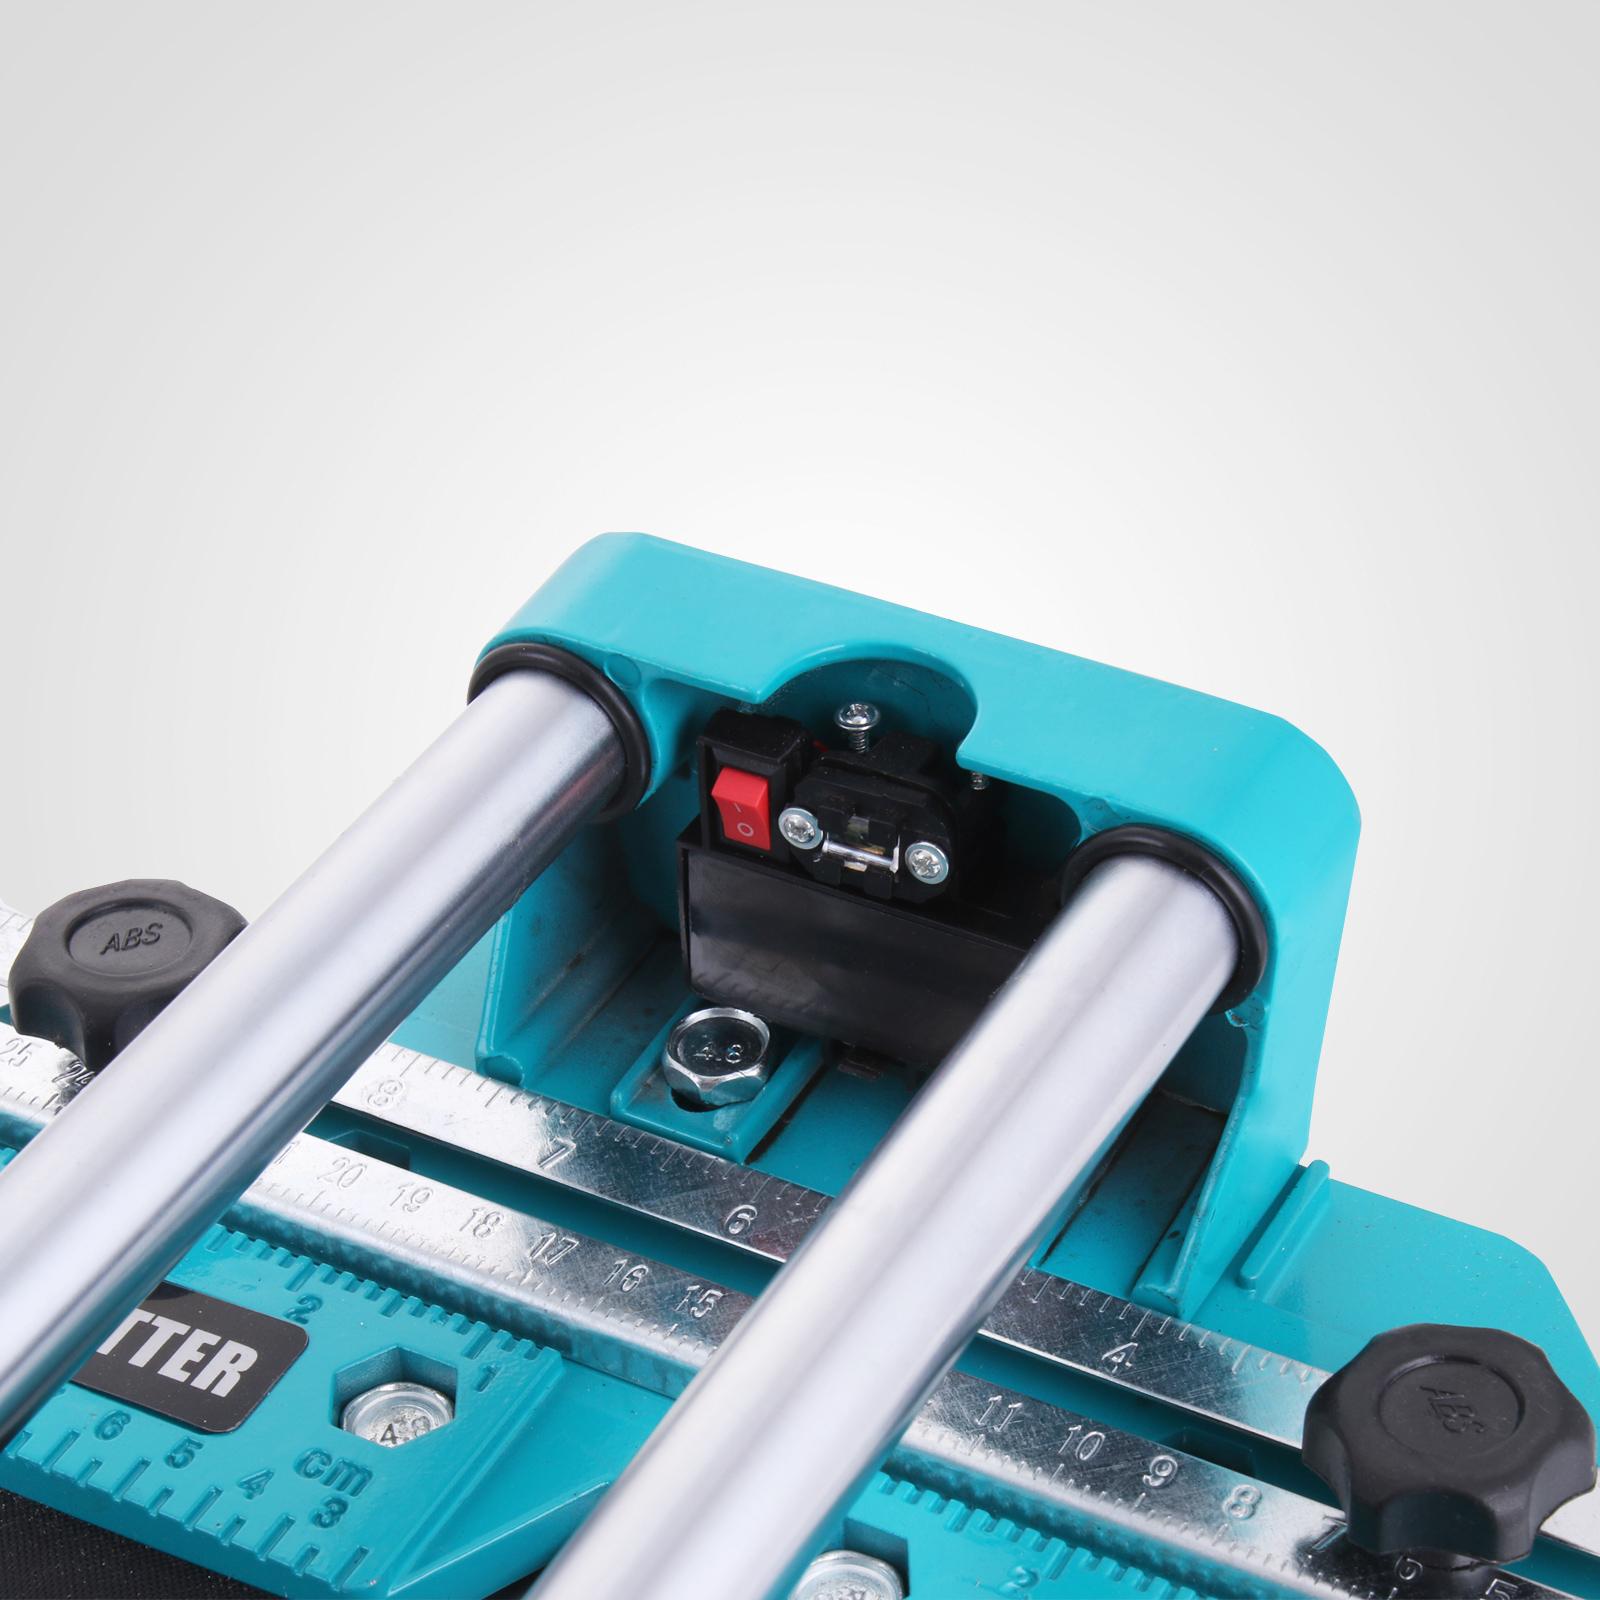 Tile-Cutter-40-034-48-039-039-Manual-Cutting-Machine-0-24-0-6-Thickness-Porcelain-Ceramic thumbnail 34